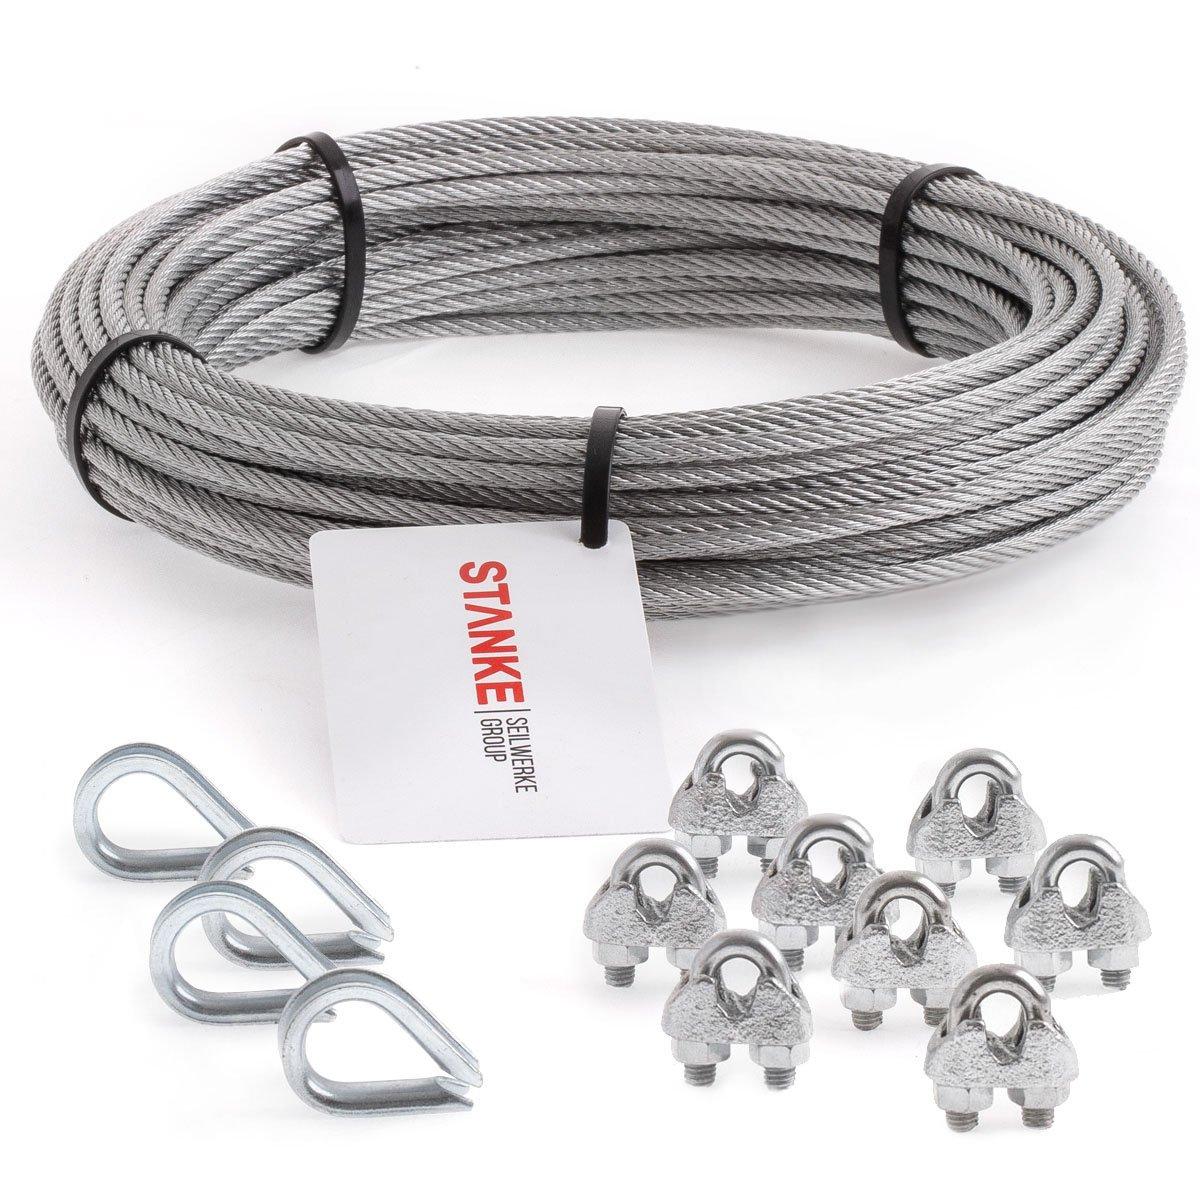 Seilwerk STANKE Rankhilfe Drahtseil verzinkt 20m Stahlseil 6mm 6x7, 4x Kausche, 8x Bü gelformklemme - SET 2